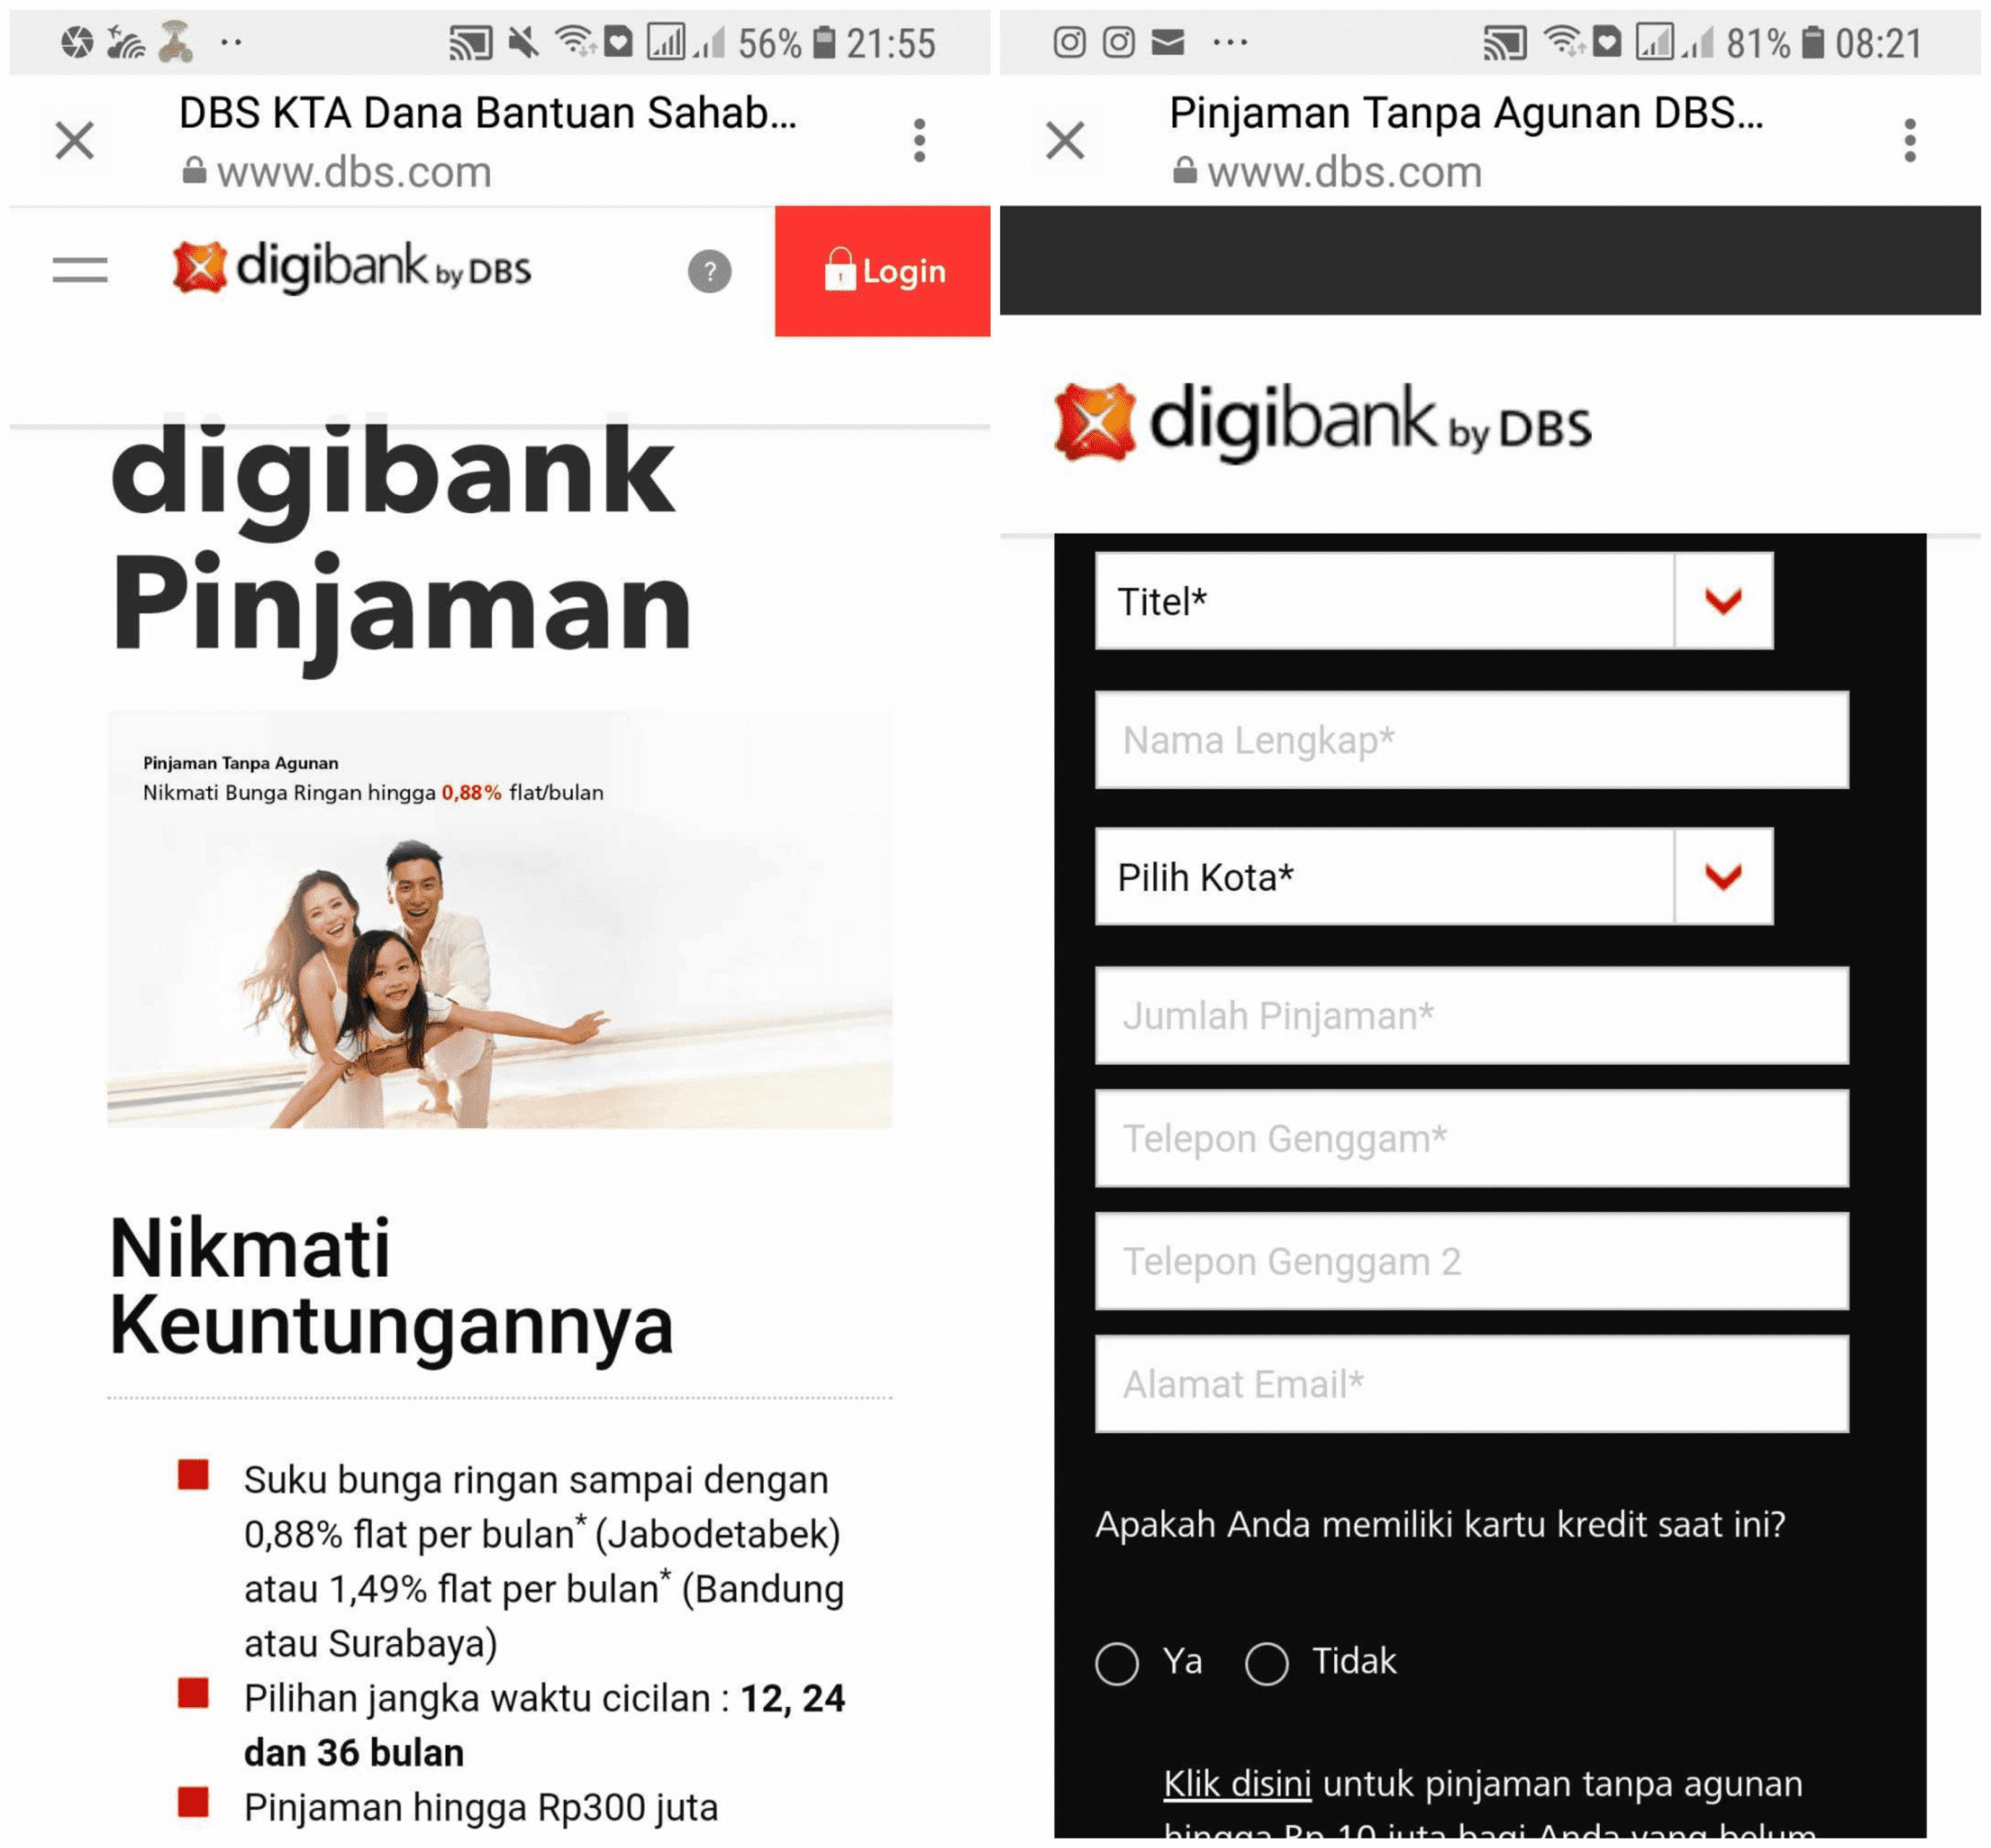 KTA Digibank DBS Pinjaman Uang Online